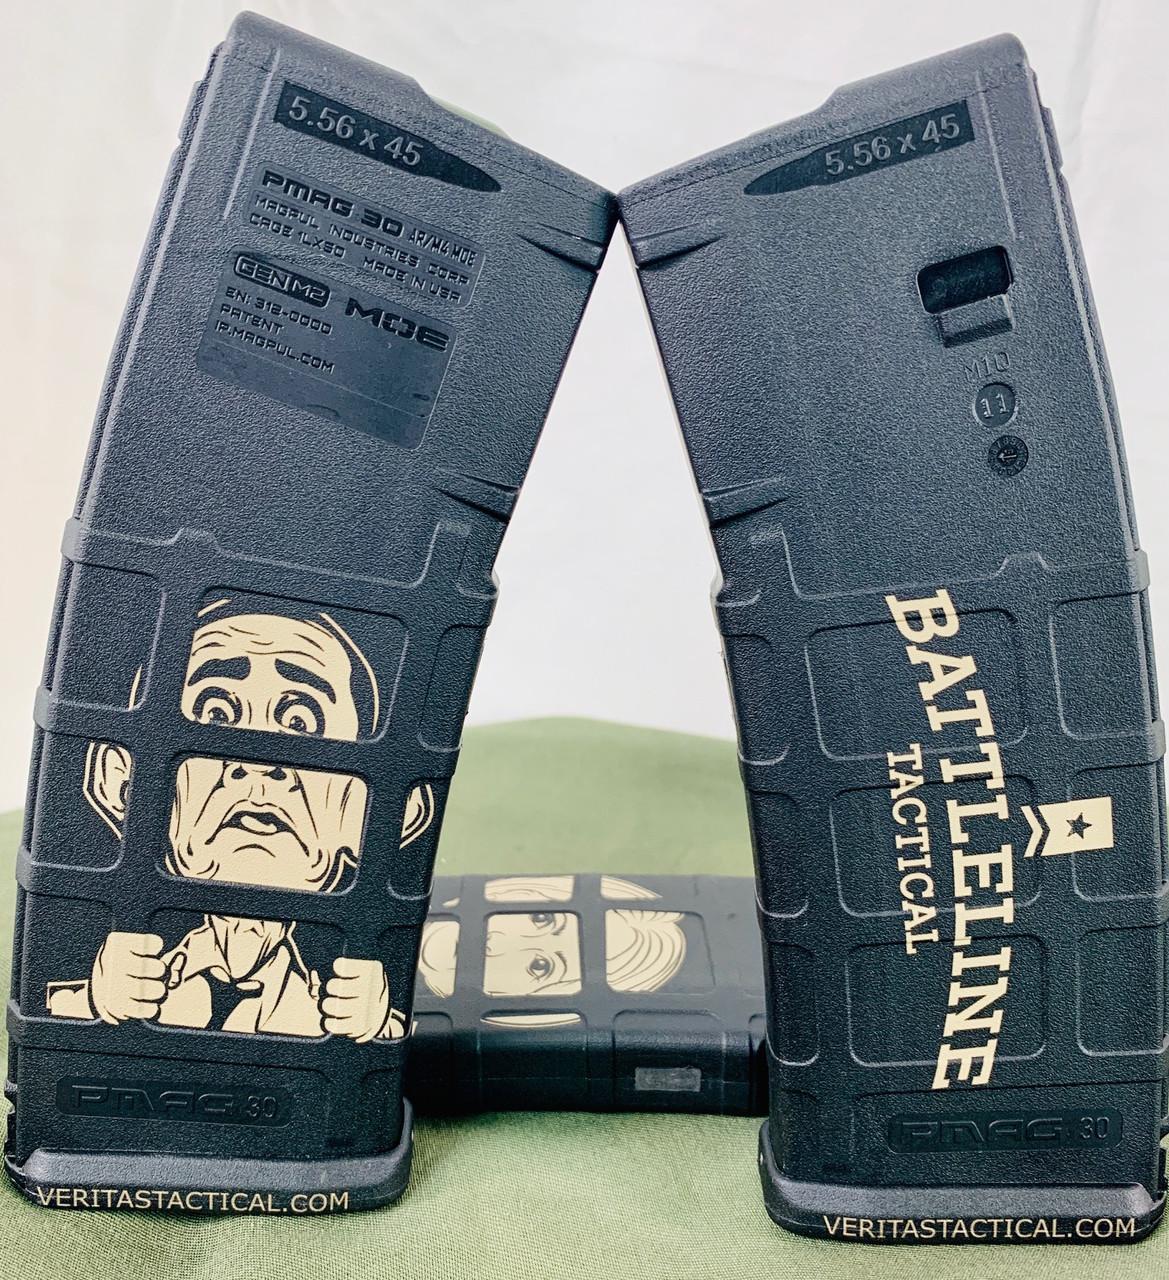 Battleline Tactical Traitor Obama Laser Engraved Magazine